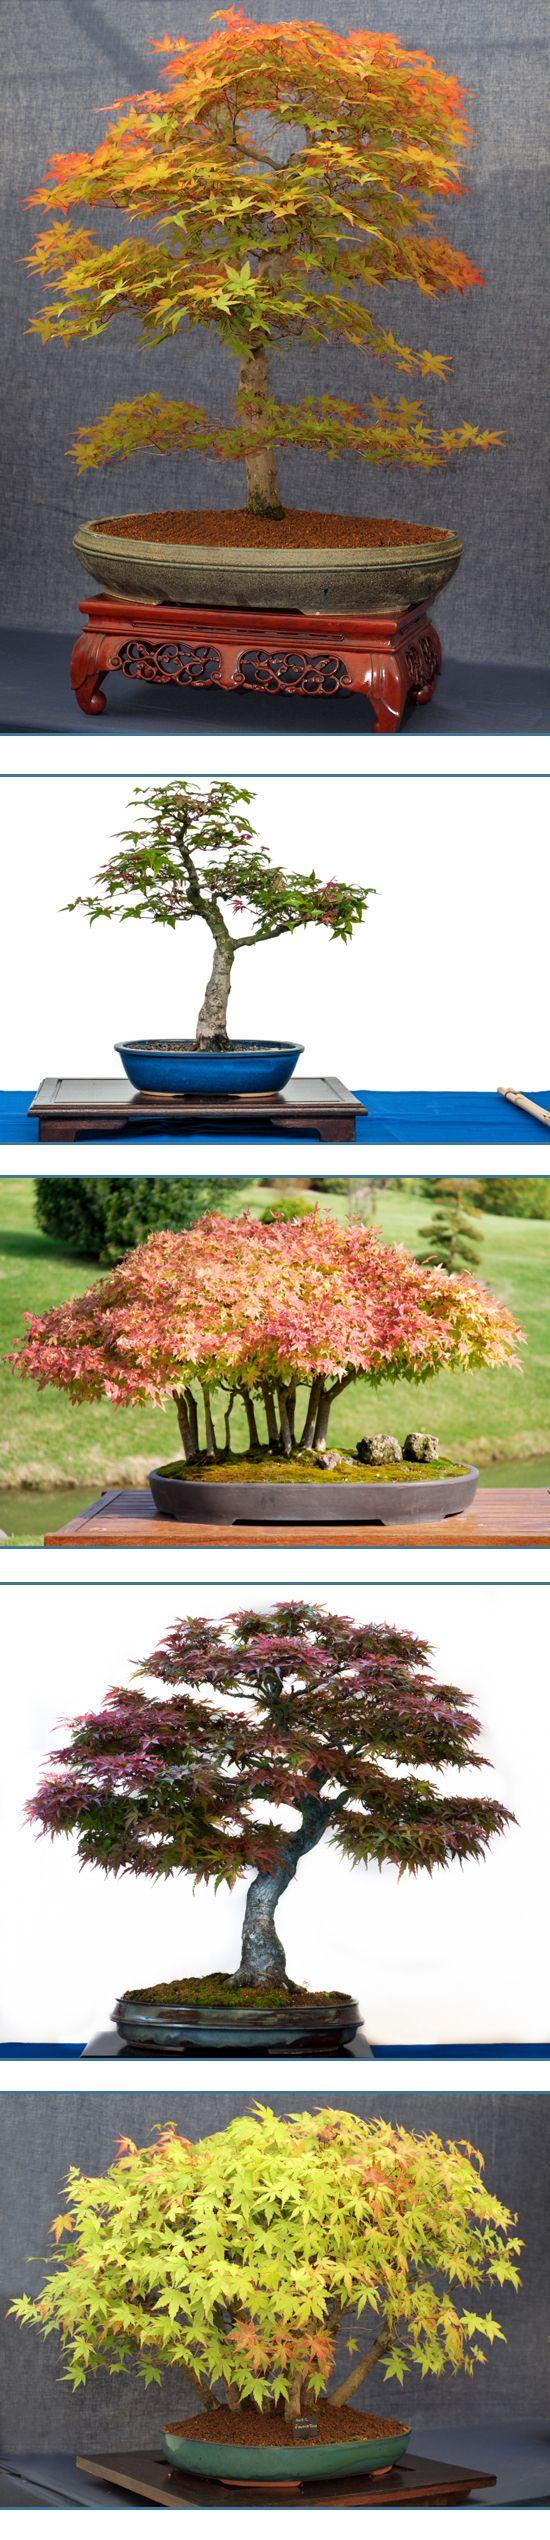 Arce japon s bons i la belleza en miniatura bonsai - Arce japones cuidados ...